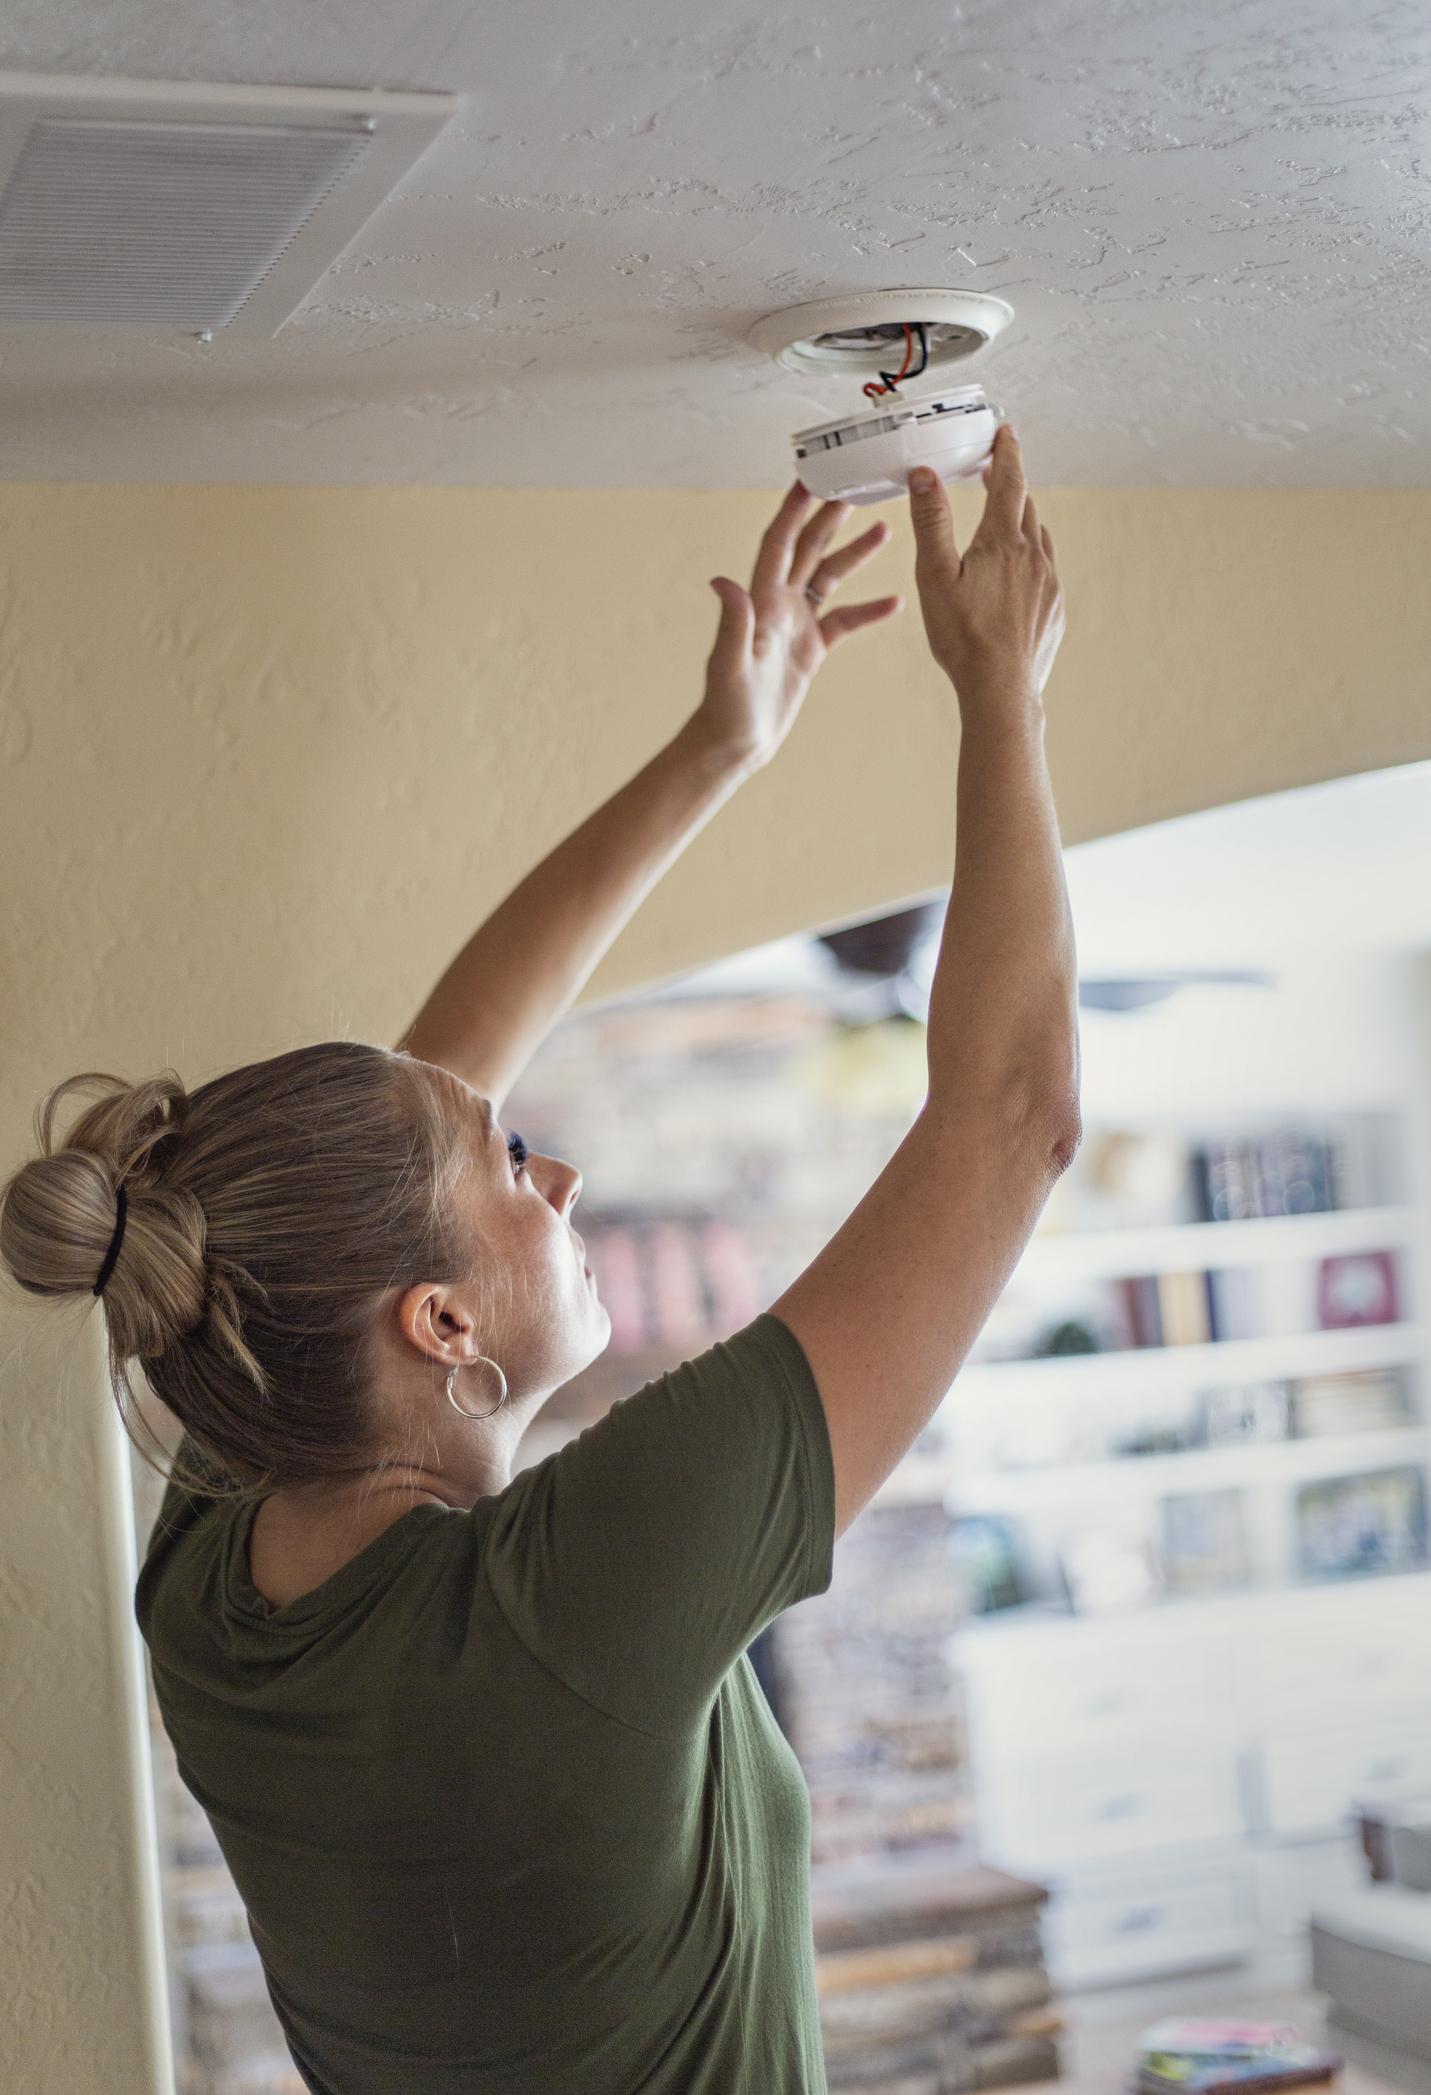 Woman installing a smoke alarm